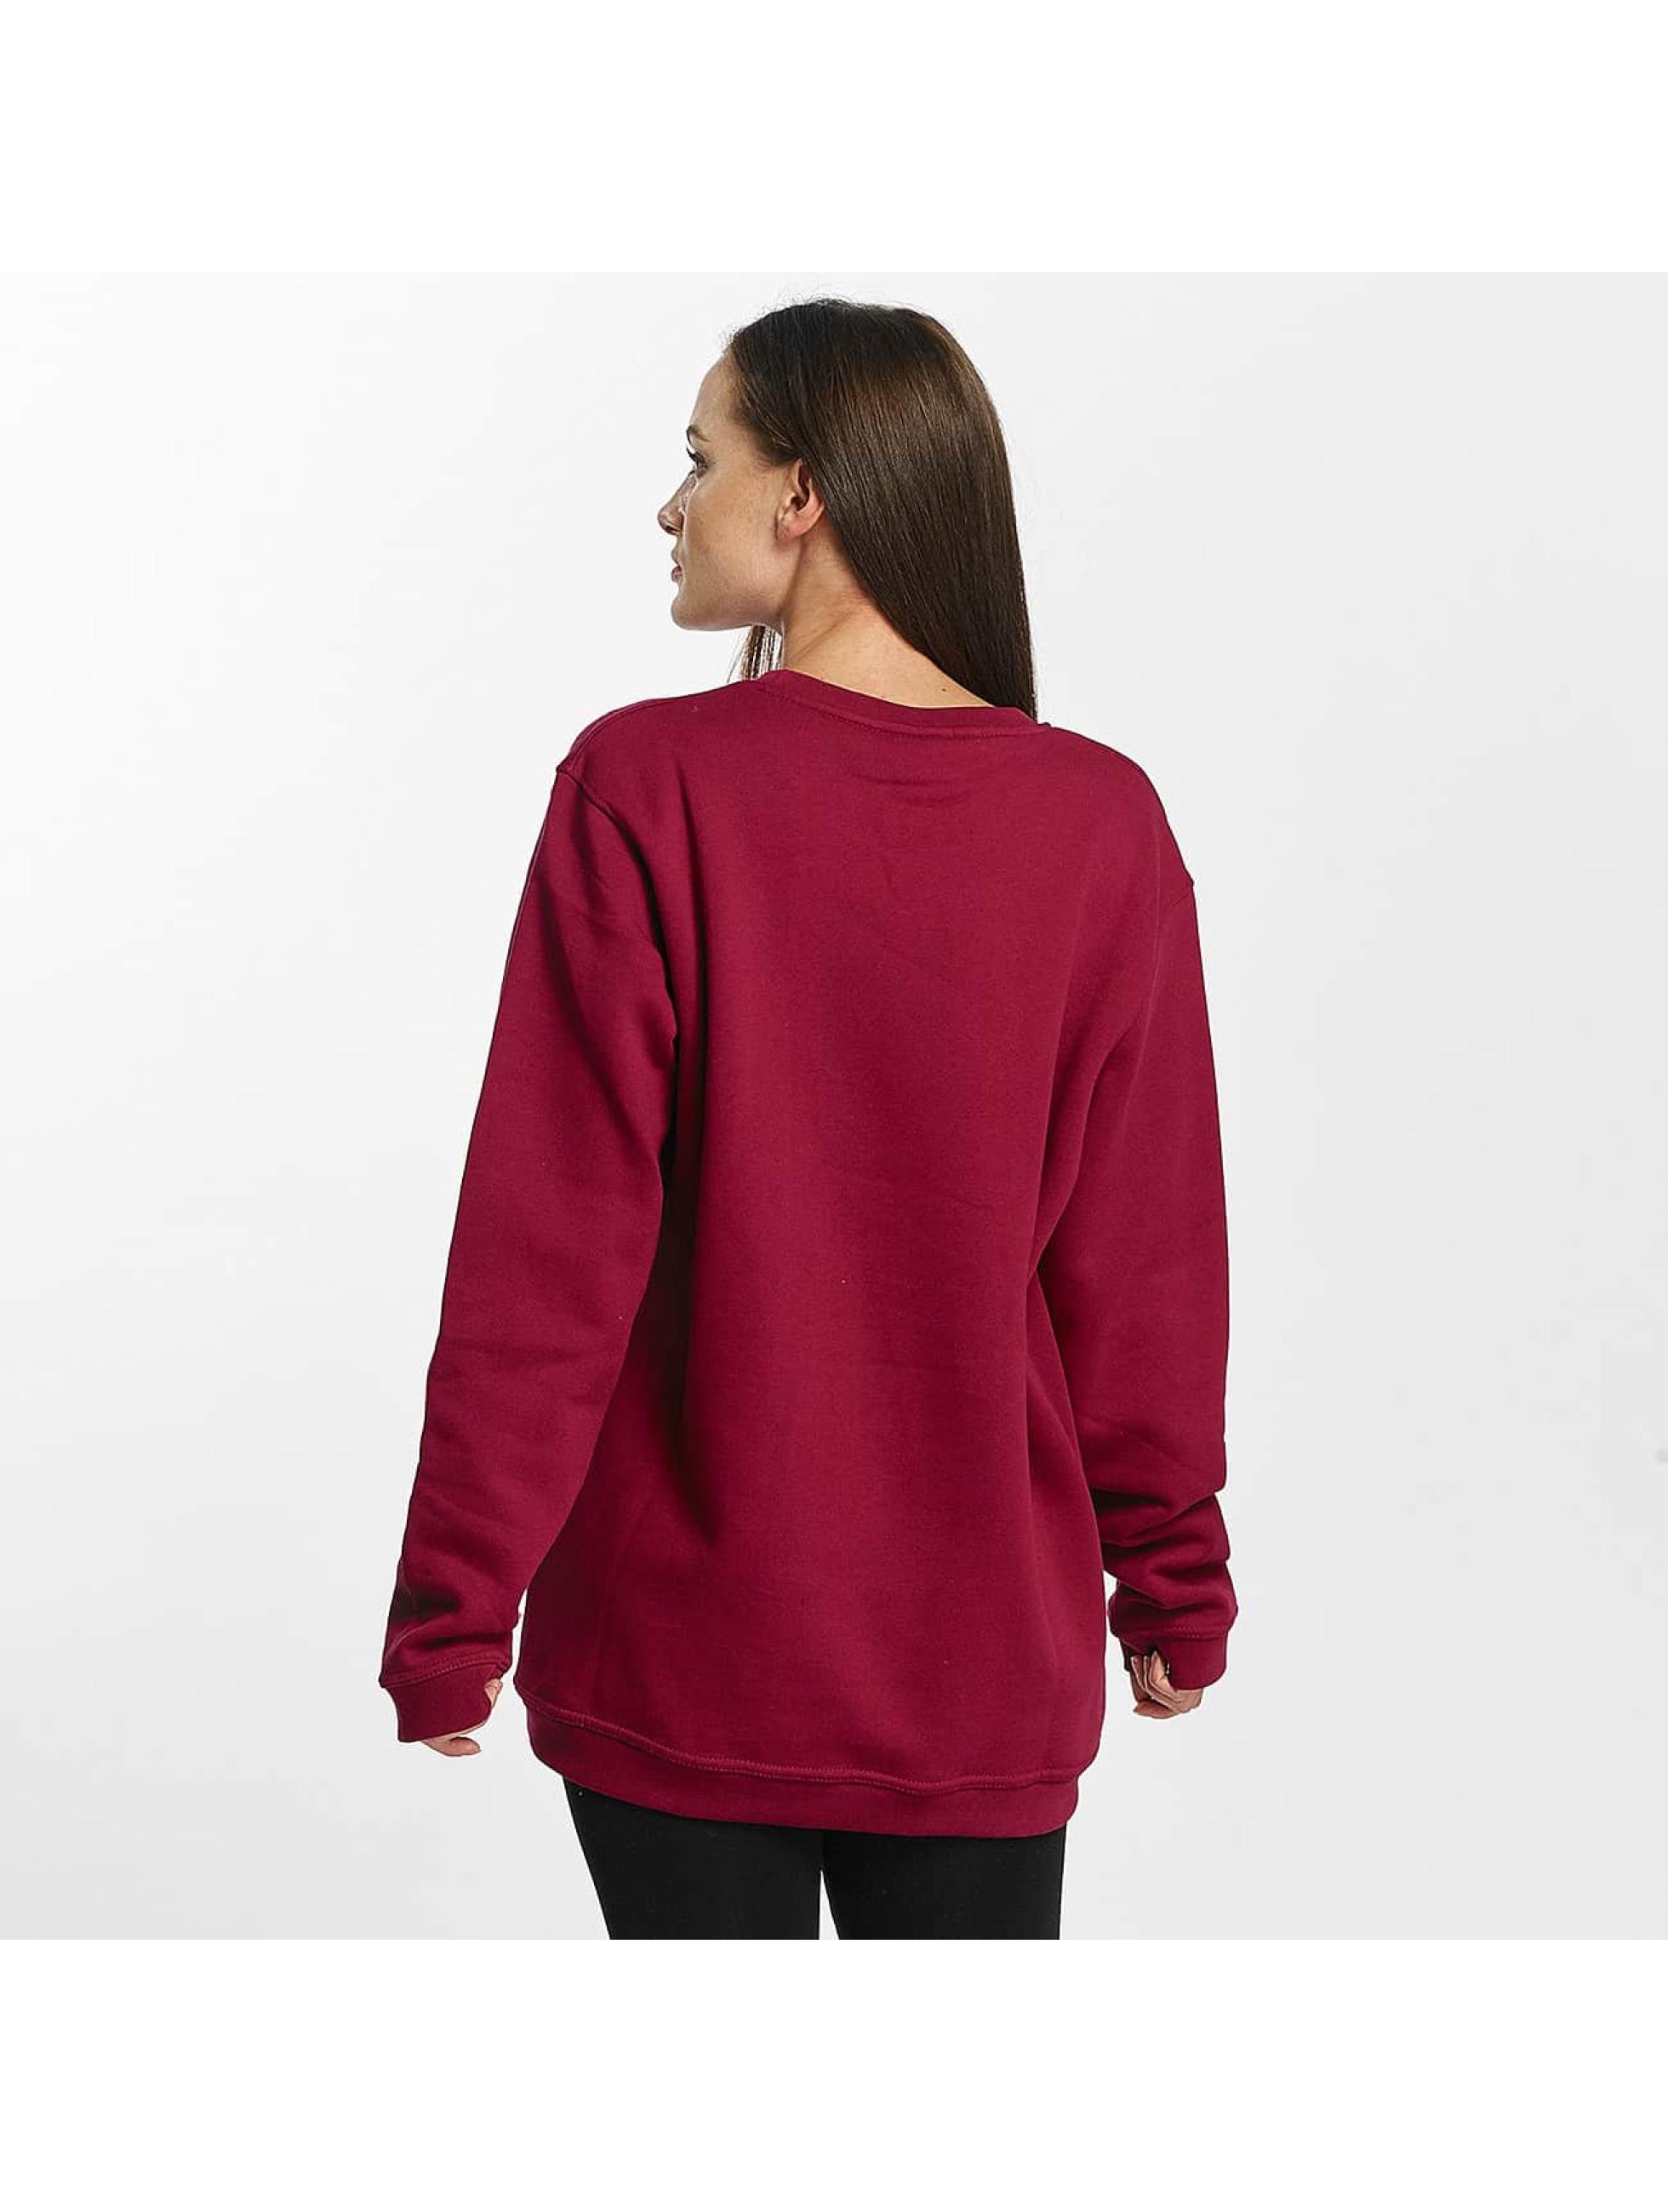 Cyprime Пуловер Titanium Oversized красный